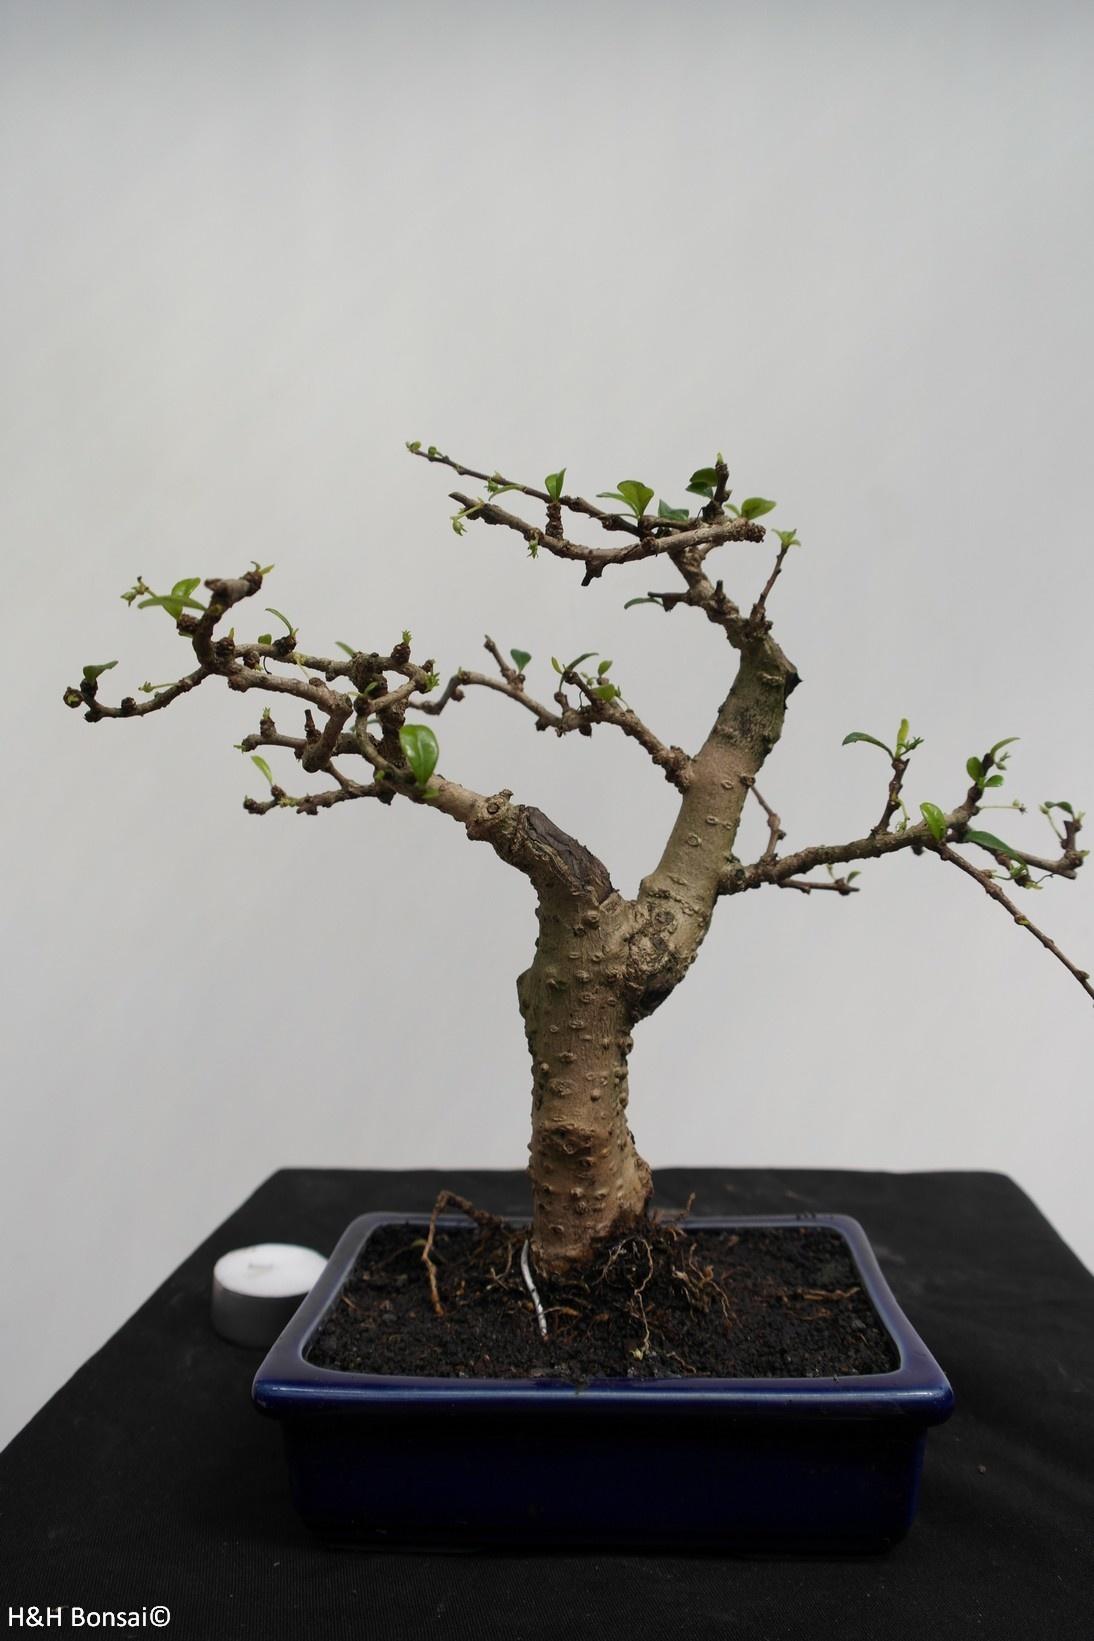 Bonsai Fukien Tea,Carmona macrophylla, no. 7867